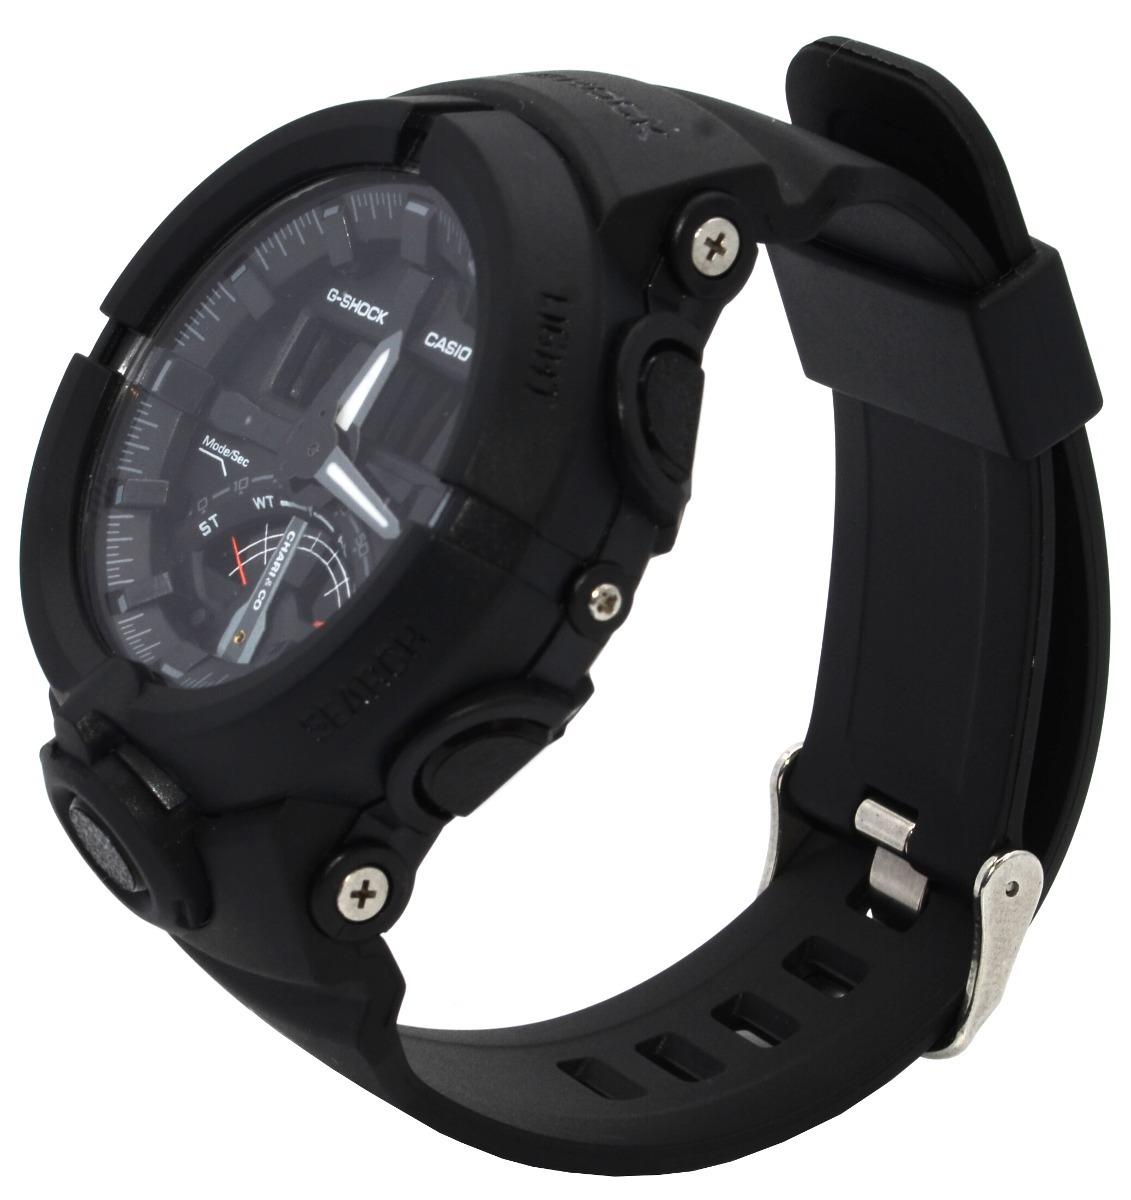 3a751b6871f relógio masculino casio g-shock ga-500 preto lancamento!! Carregando zoom.